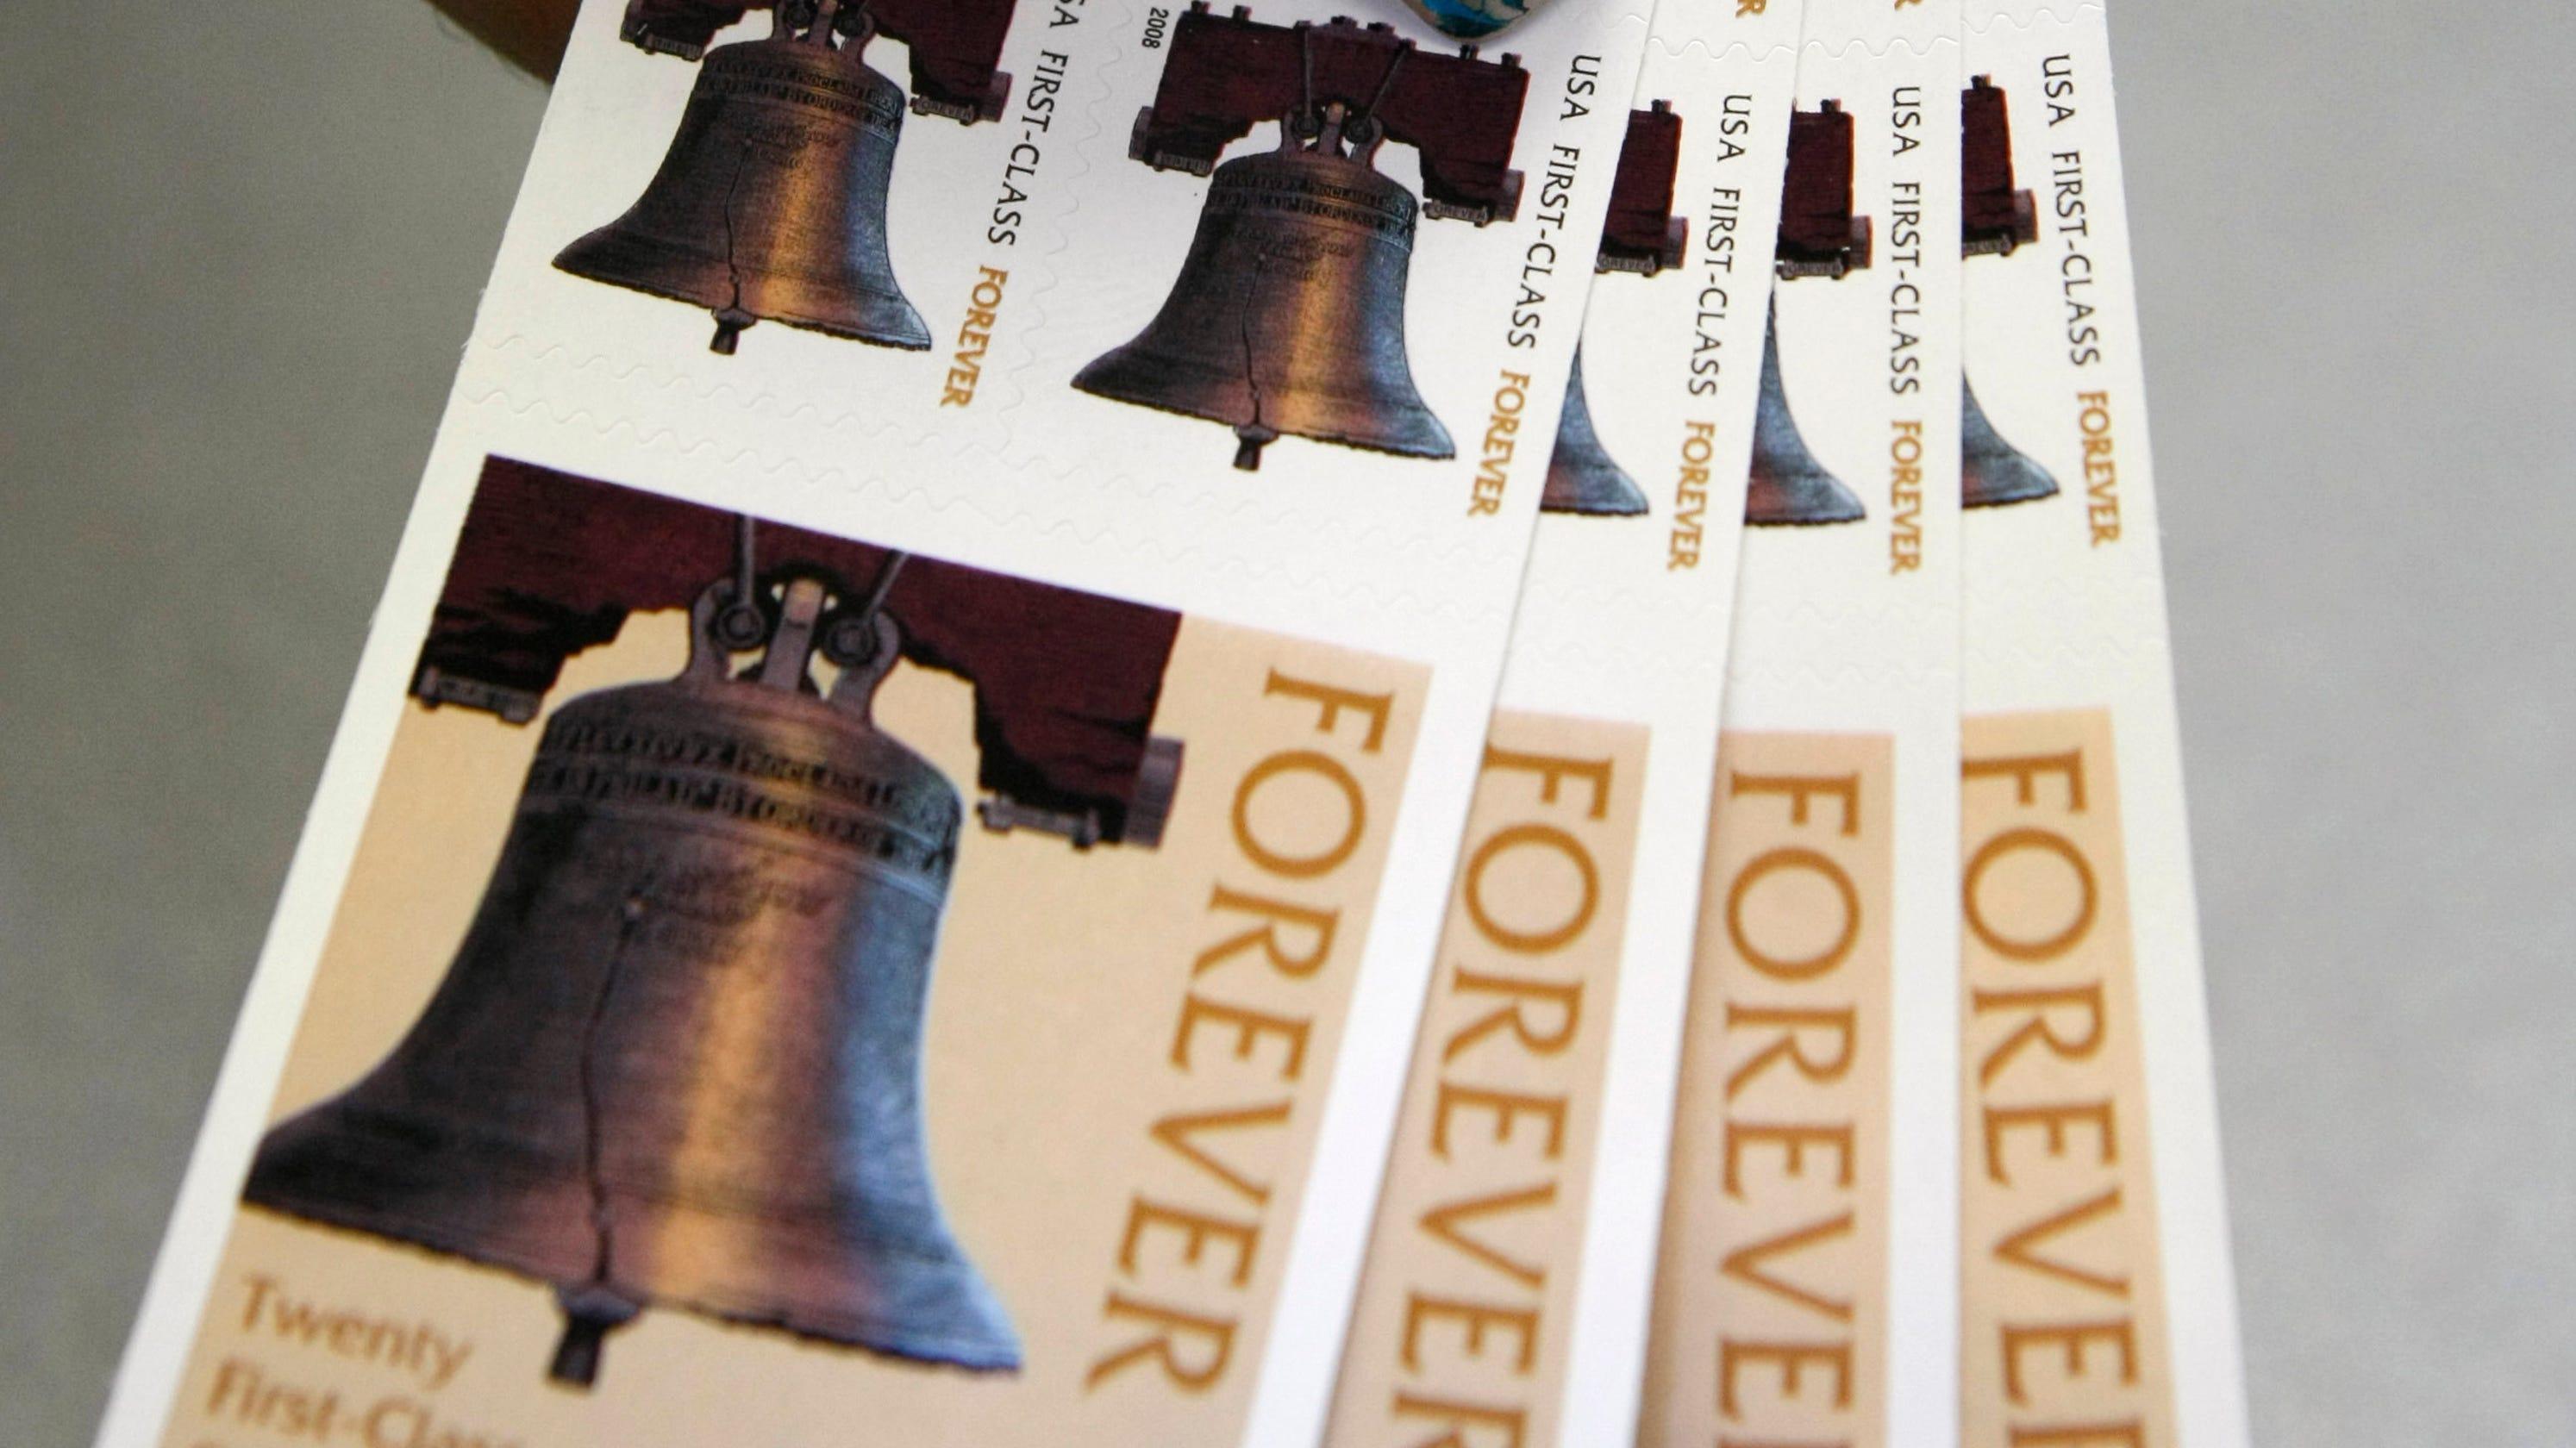 Usps Stamp Price Postal Service Proposes Biggest Hike Since 1991